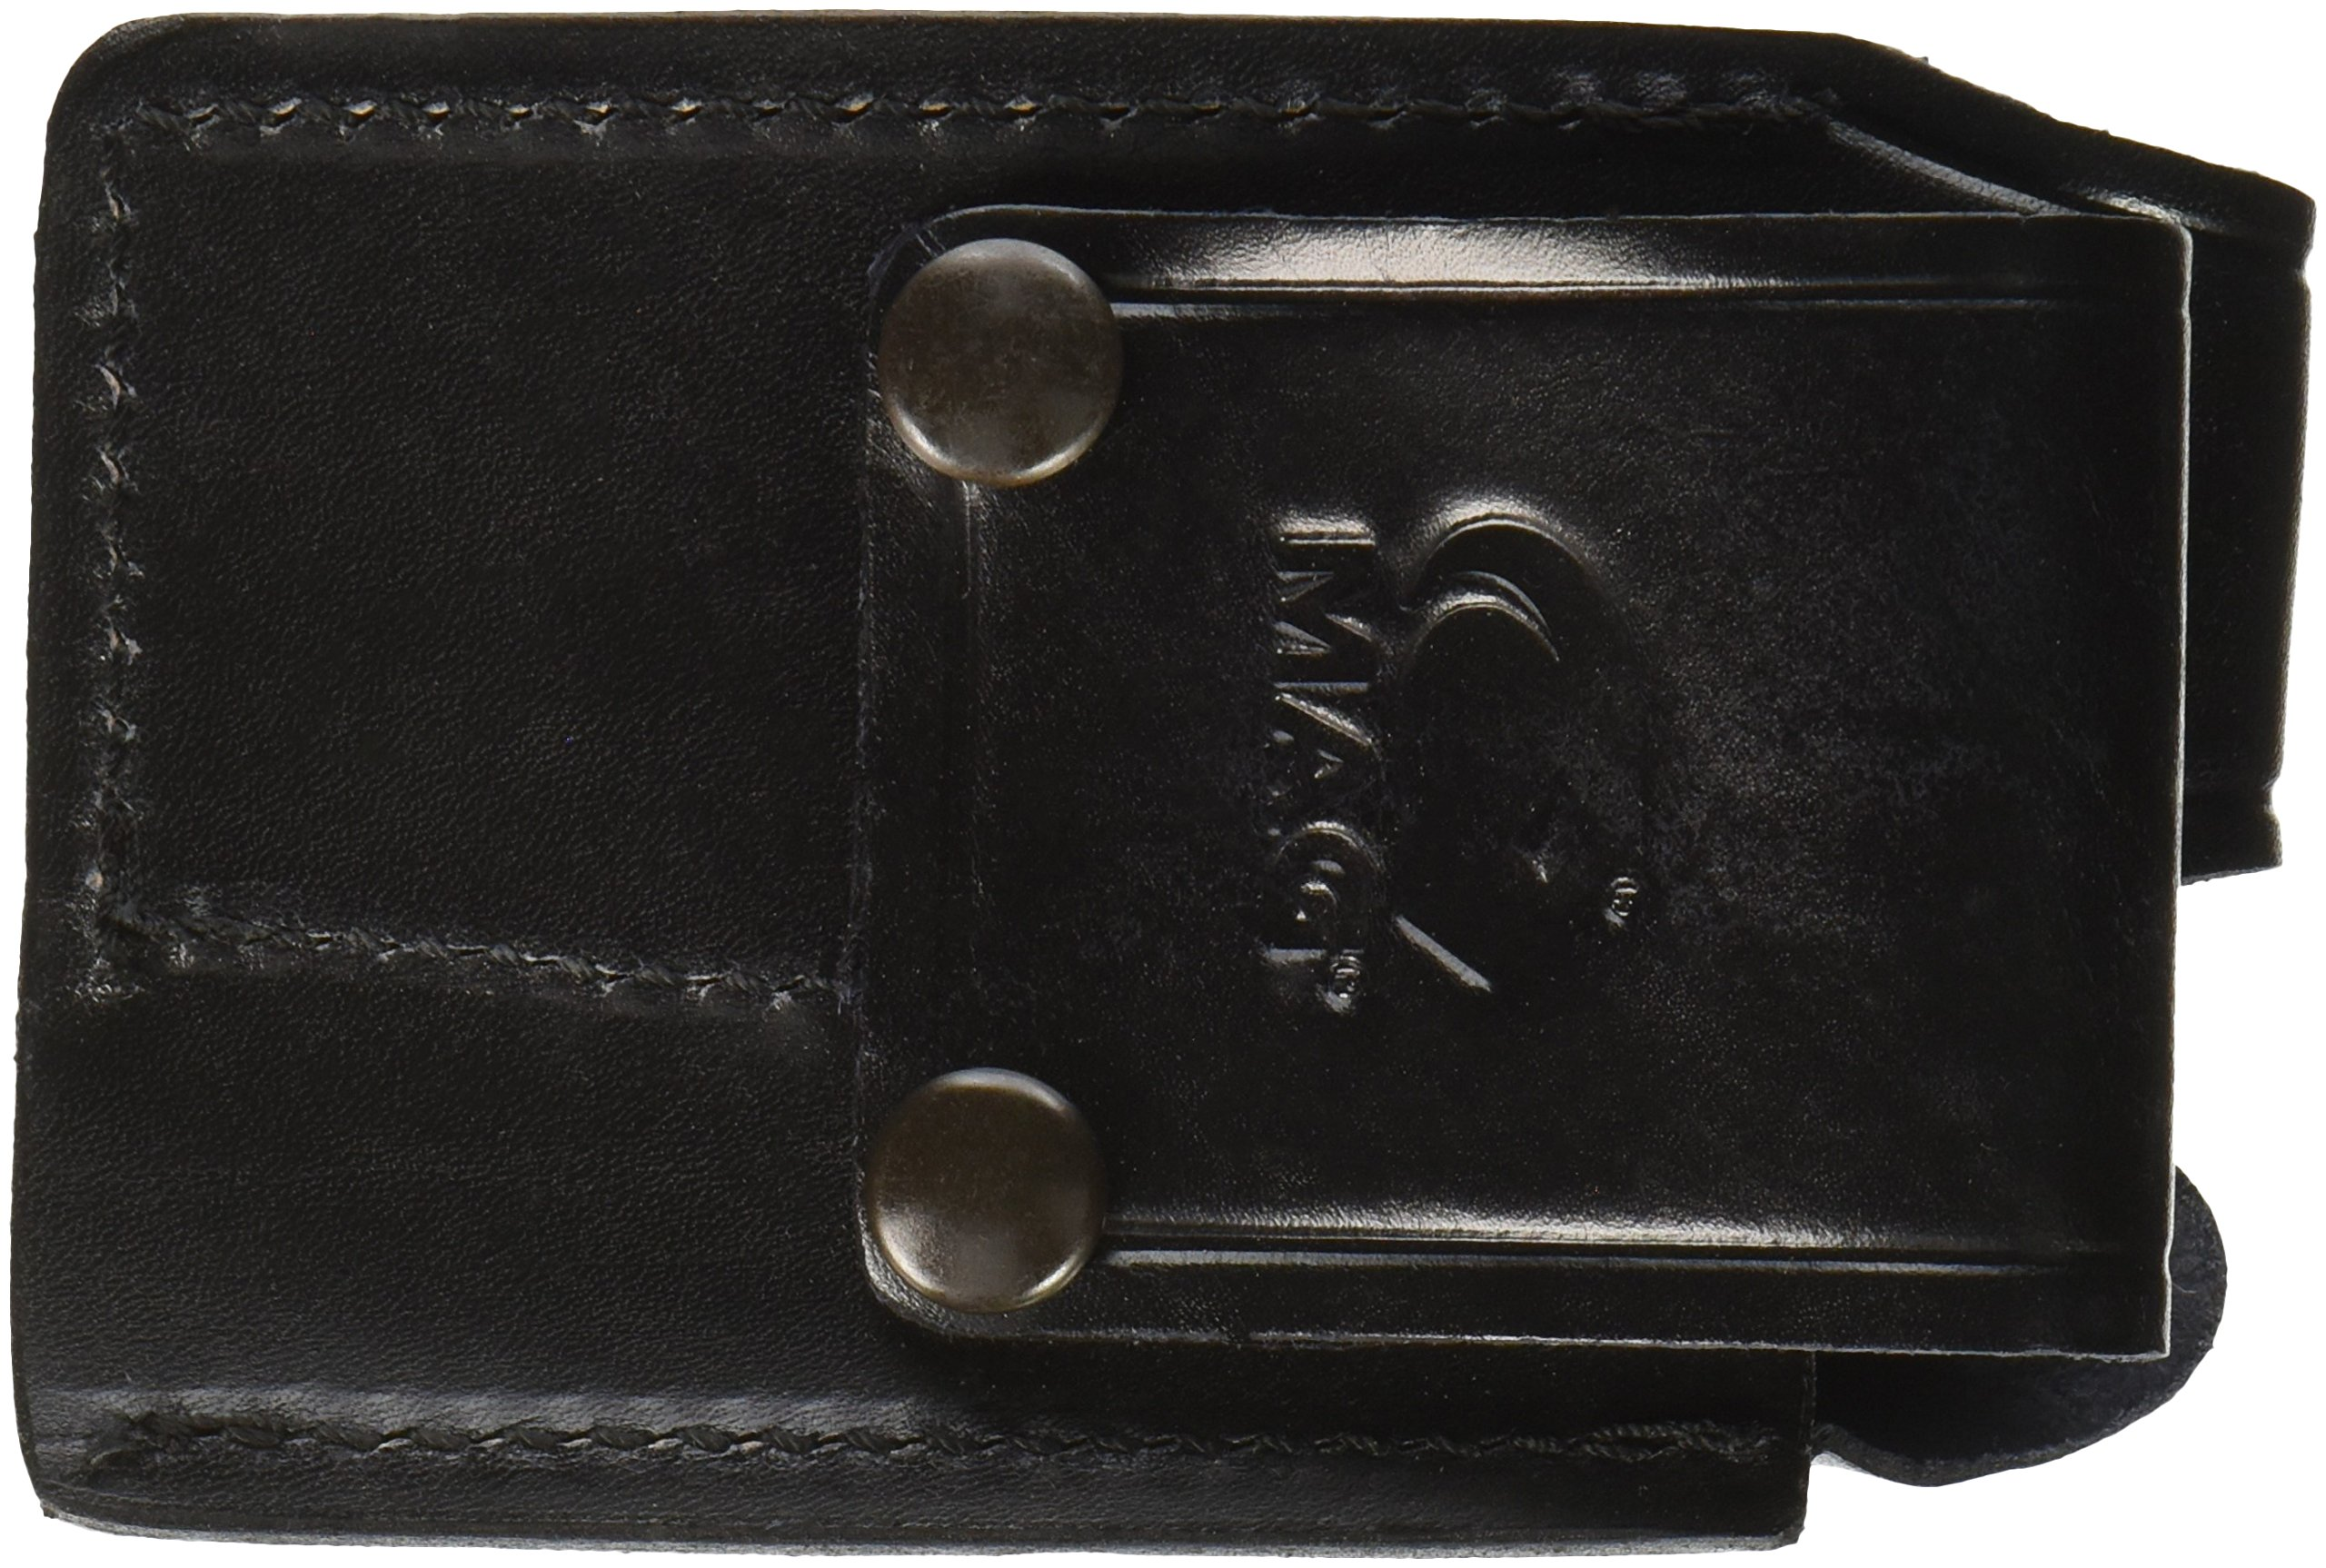 Maglite Mini Maglite/Pocket Knife Leather Holster by MagLite (Image #2)